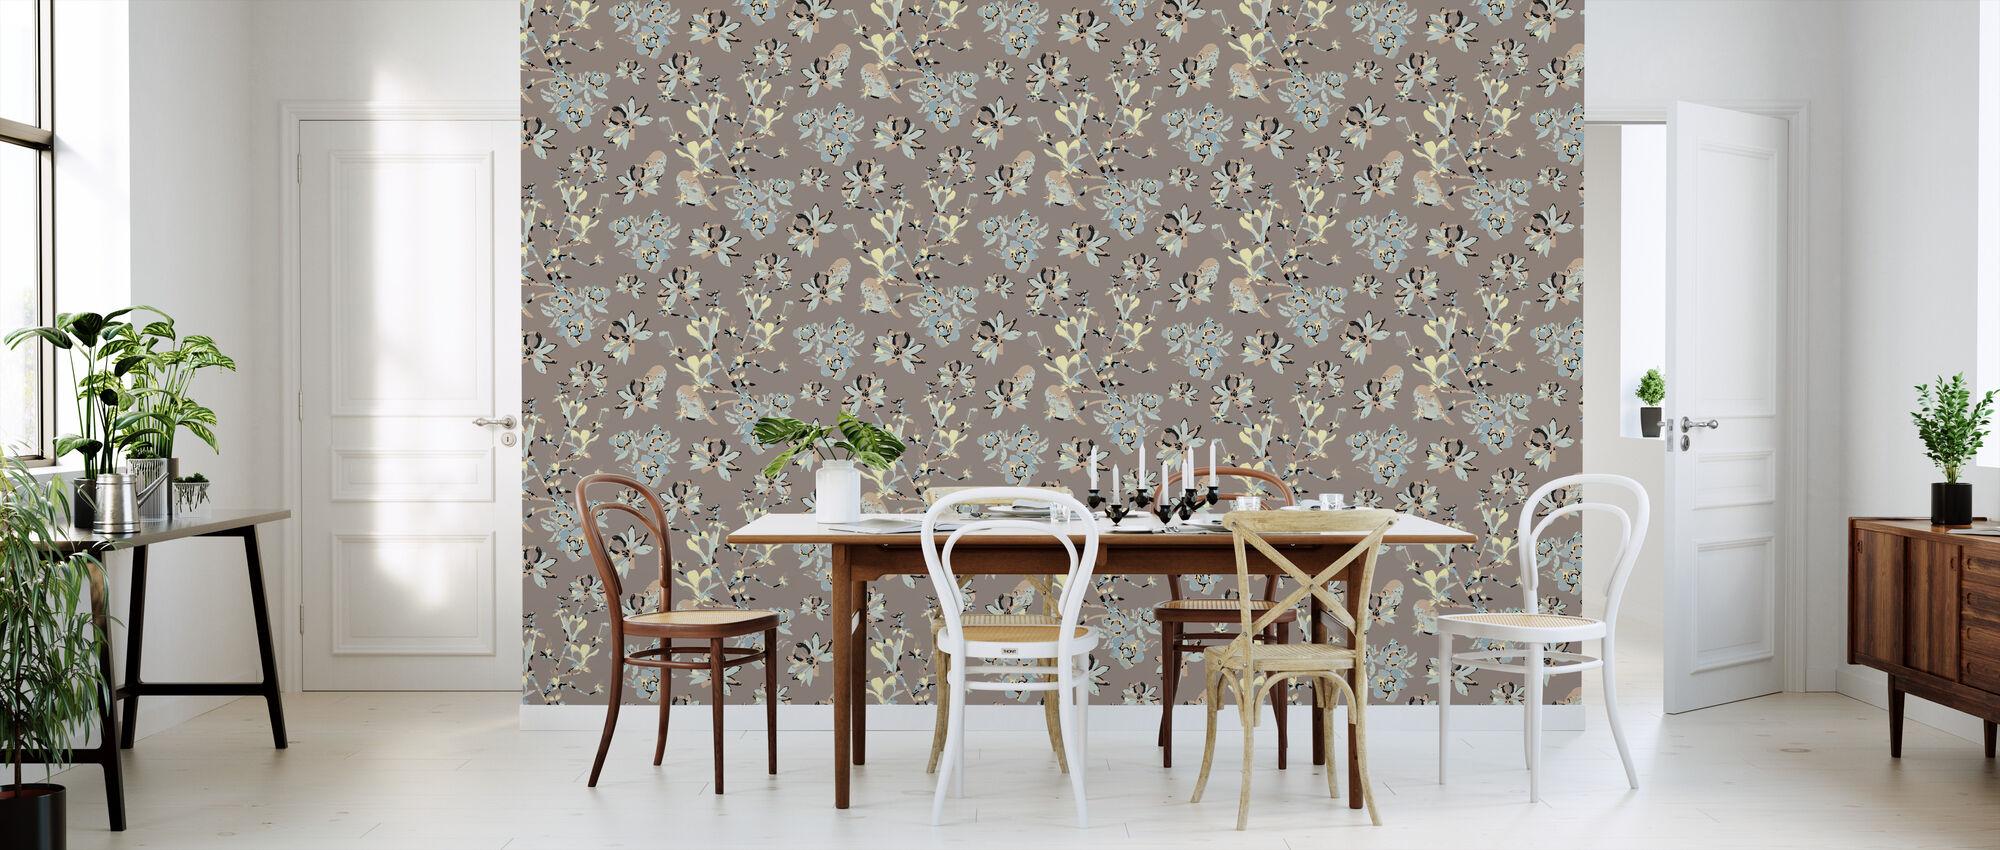 Mothers Magnolia - Wallpaper - Kitchen